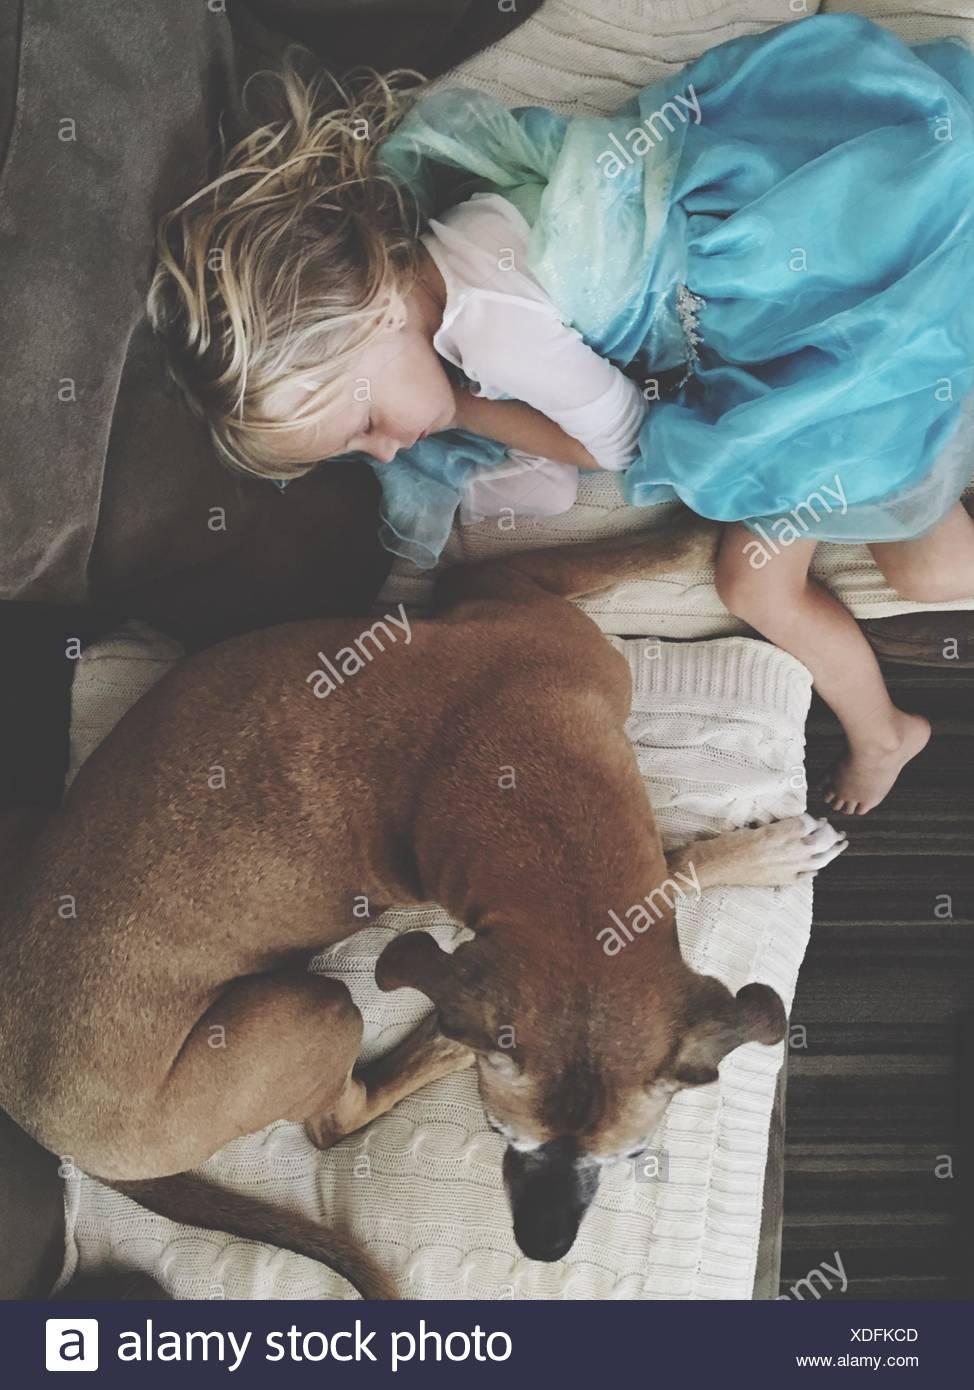 High Angle View Of Girl Sleeping On Sofa By Dog At Home - Stock Image